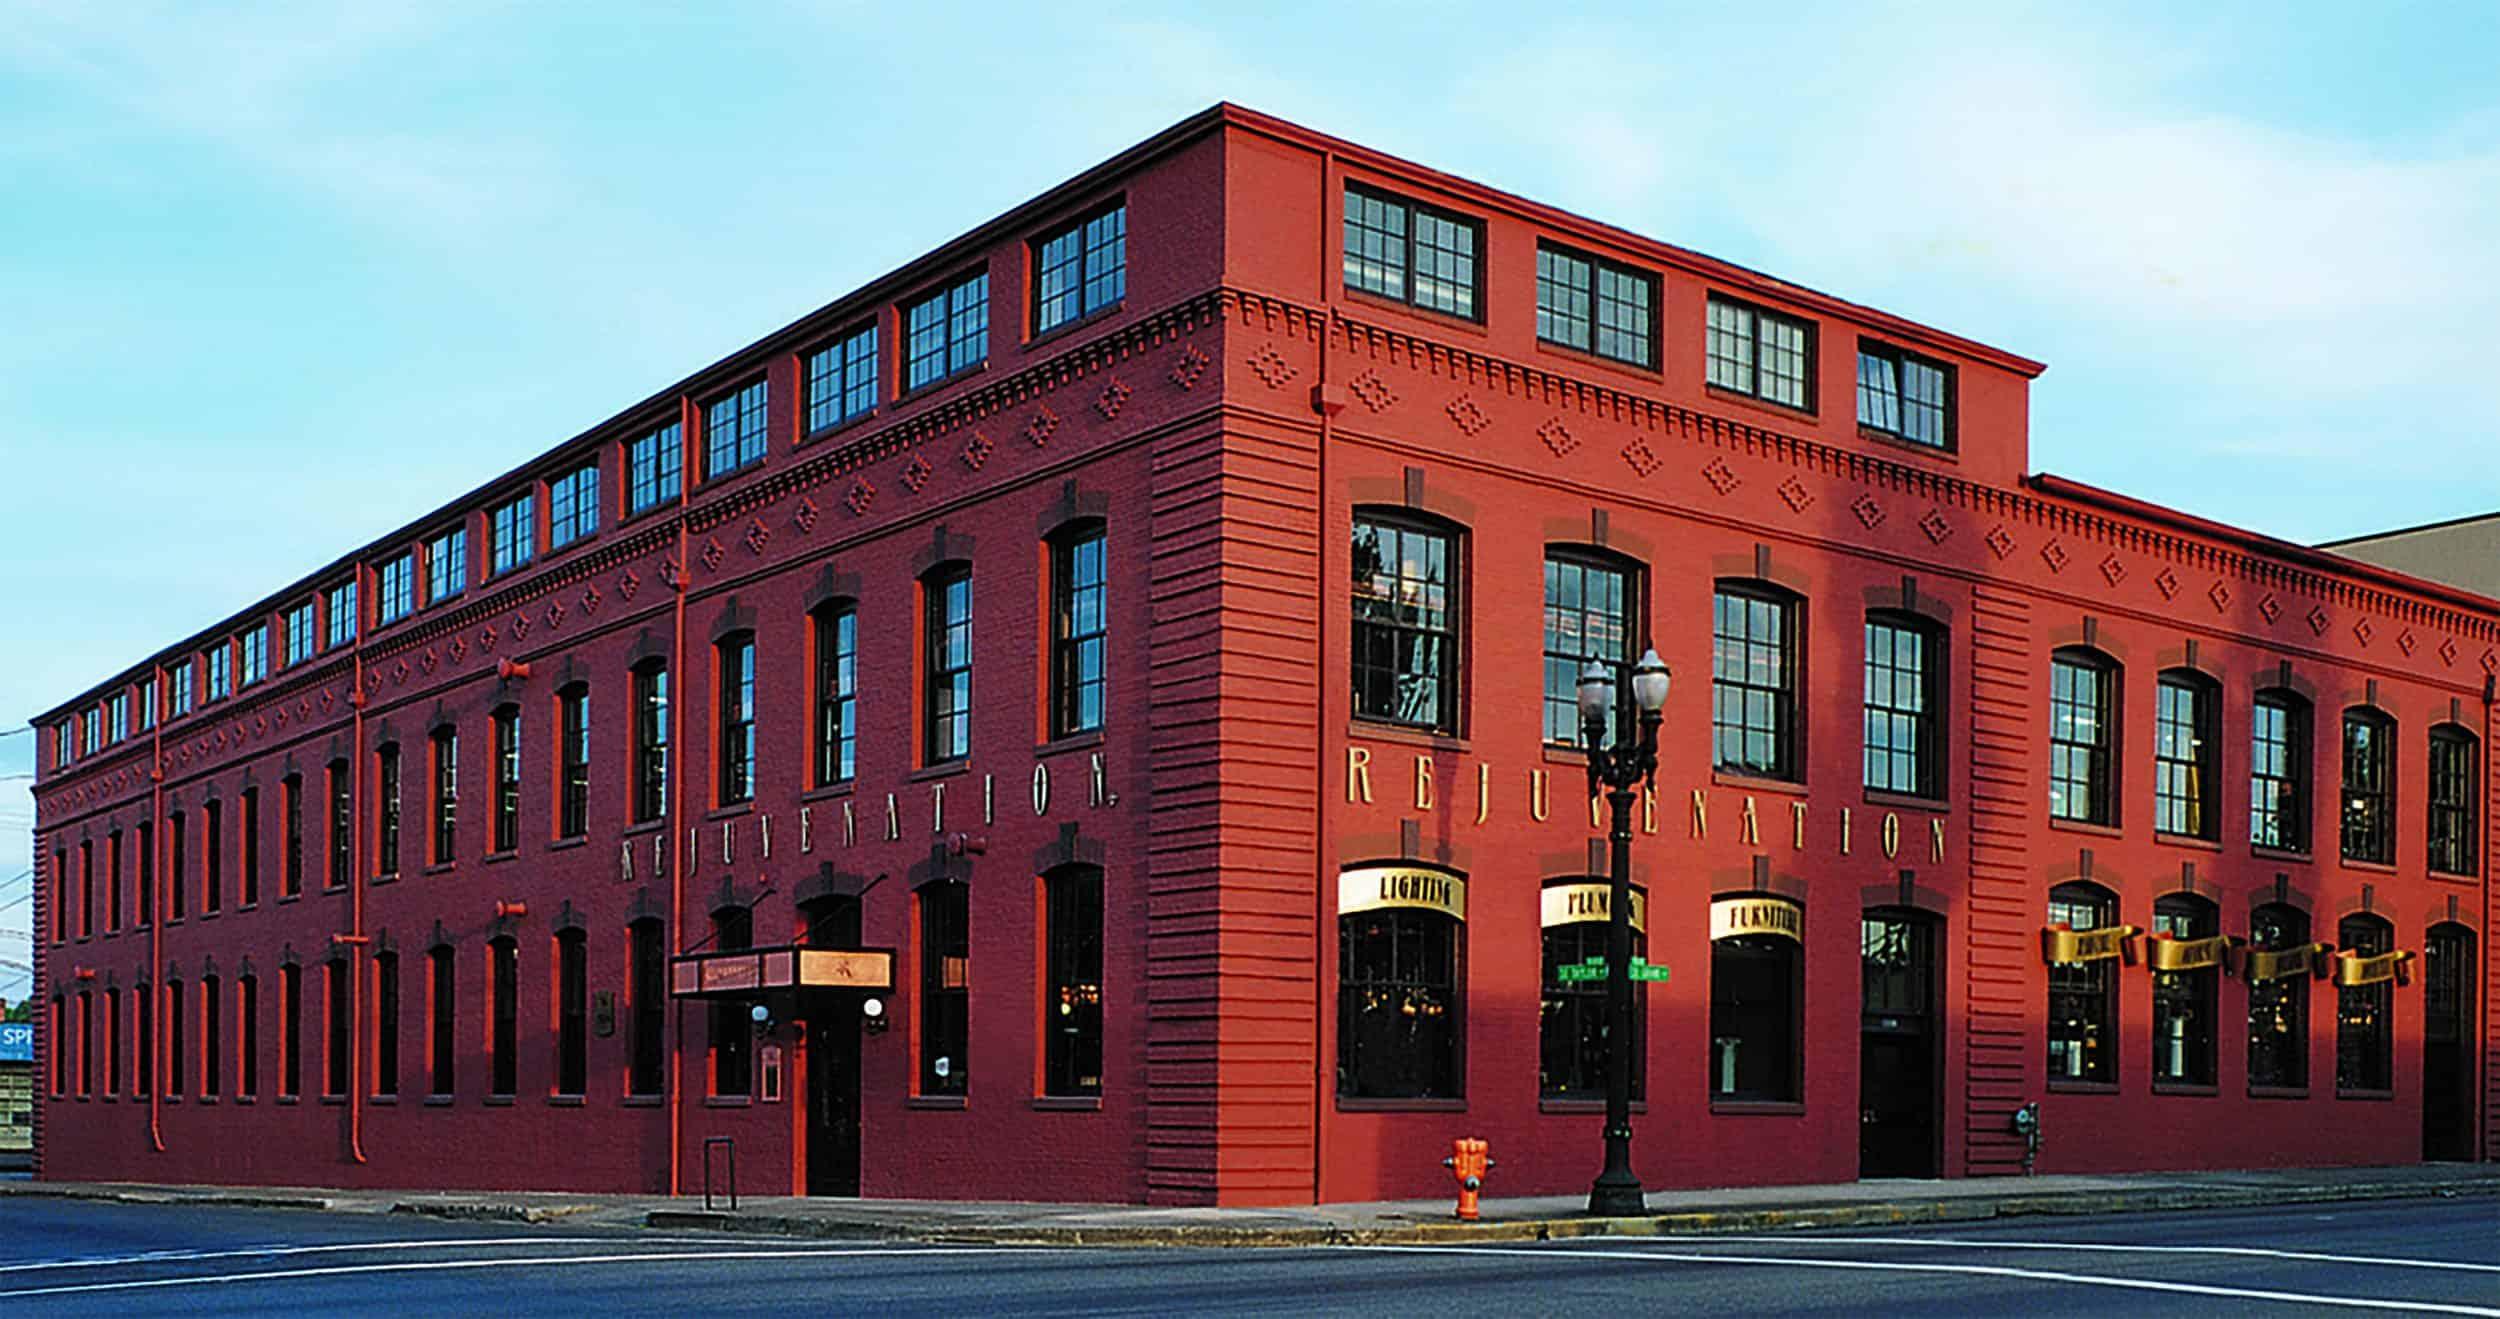 Emily Henderson Rejuvenation Portland City Guide